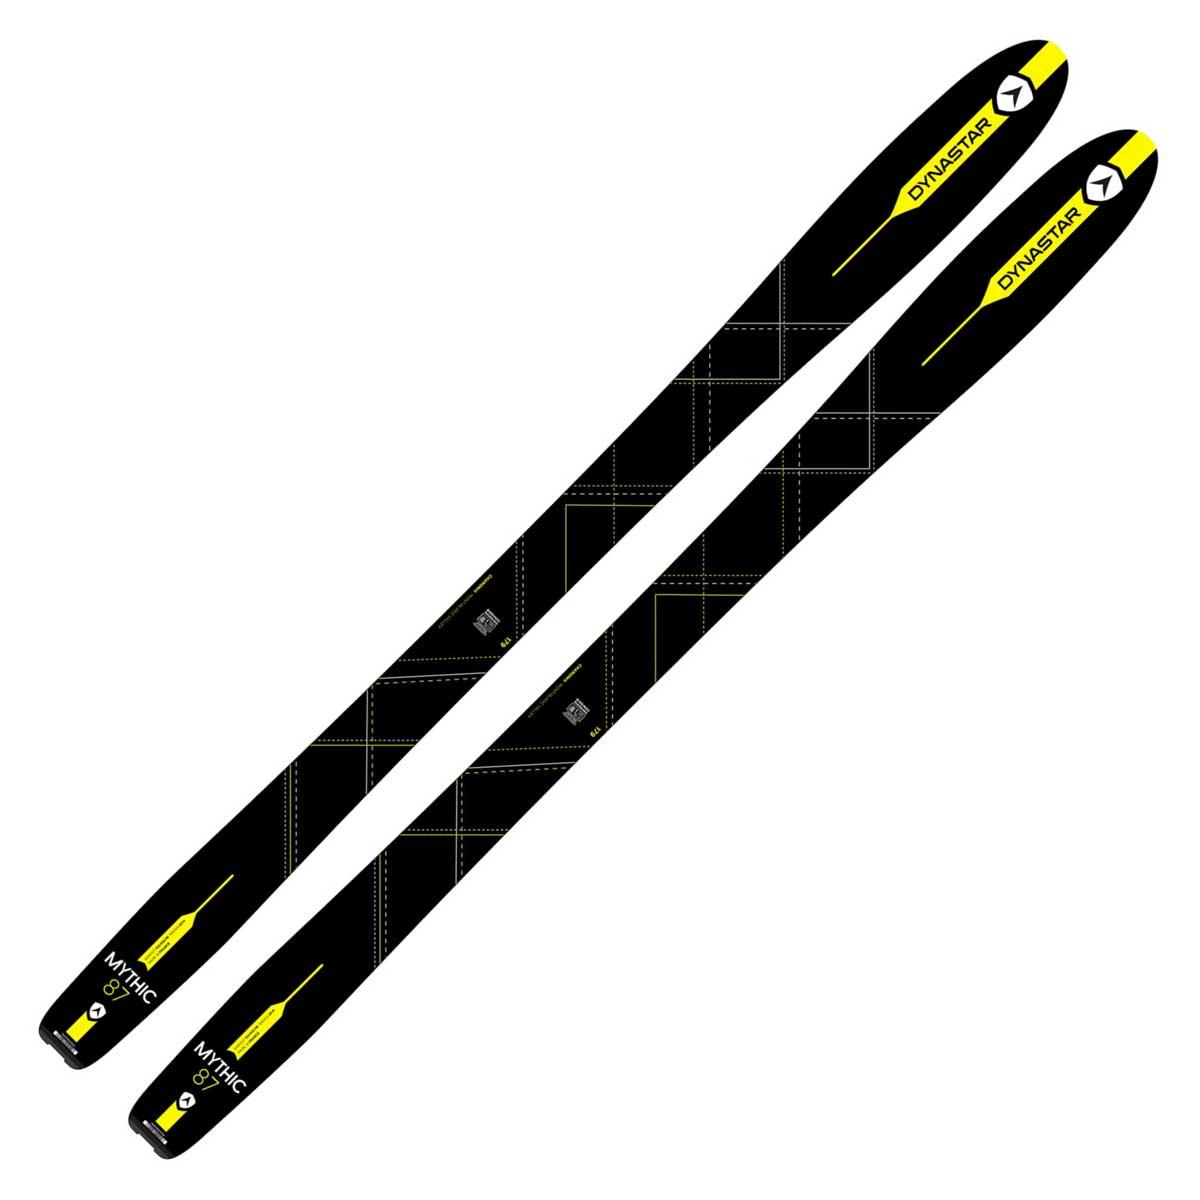 DYNASTAR(ディナスター) 金具付 DAGK901 DAGK901/FCFA041/FCFA041 MYTHIC87 スキー板 金具付 オールマウンテン【SALE スキー板】, ANIMAL-ROCK:e7e5d477 --- sunward.msk.ru